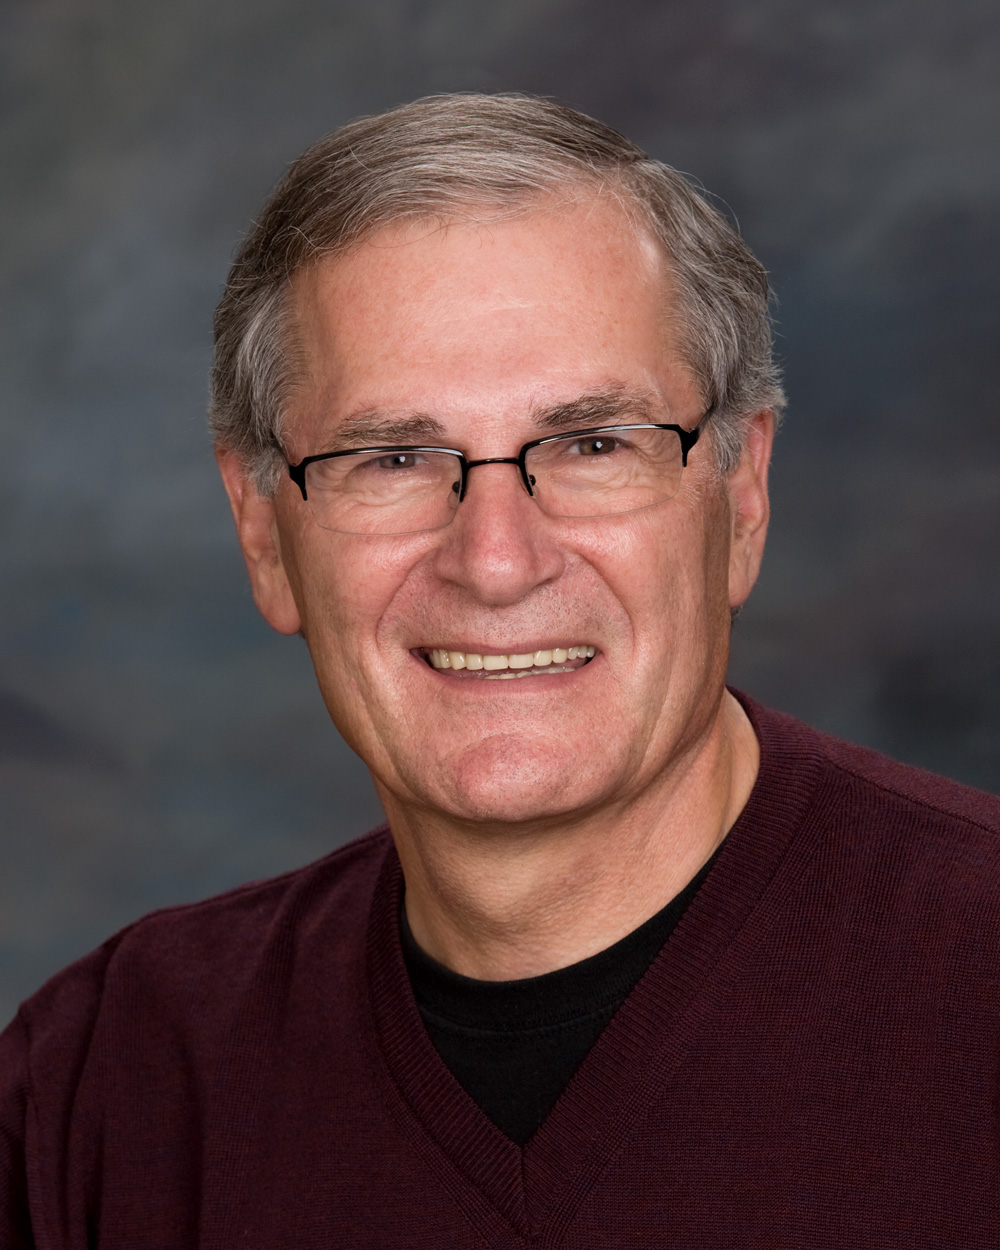 Stan simmons - Lead Pastor